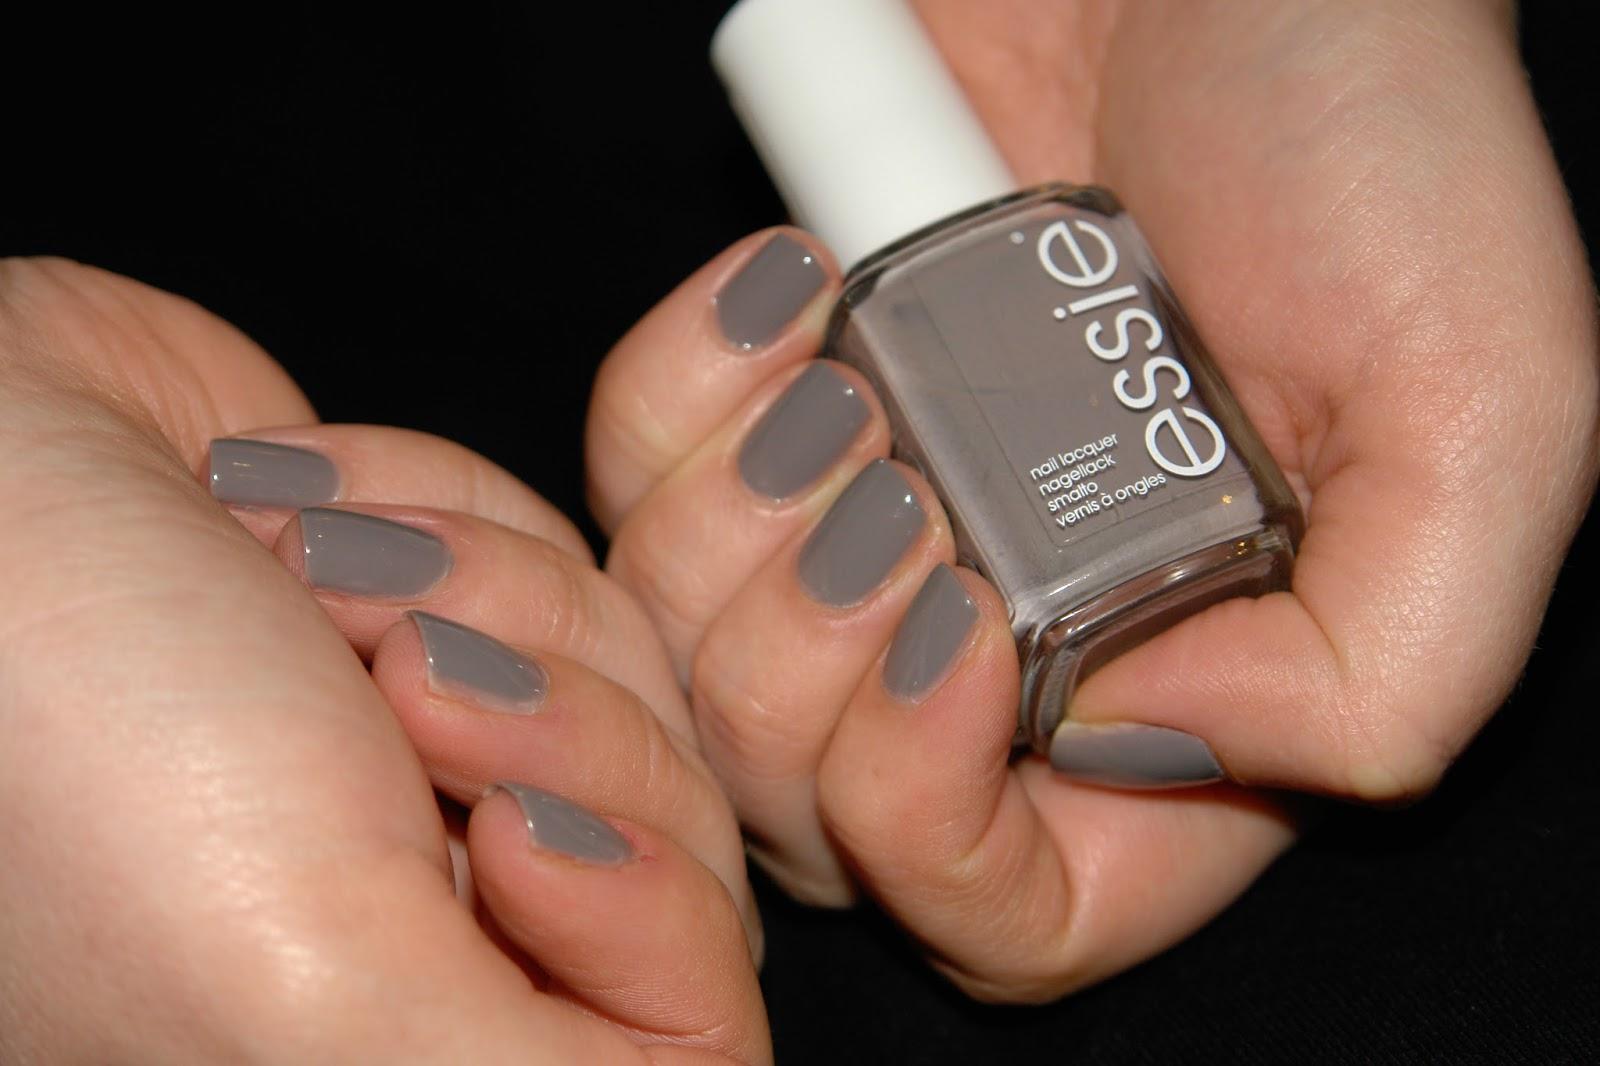 NAILS: Essie Chinchilly, Essie, grey, nail polish, nails, NOTD, swatches, beauty blog, UK blogger